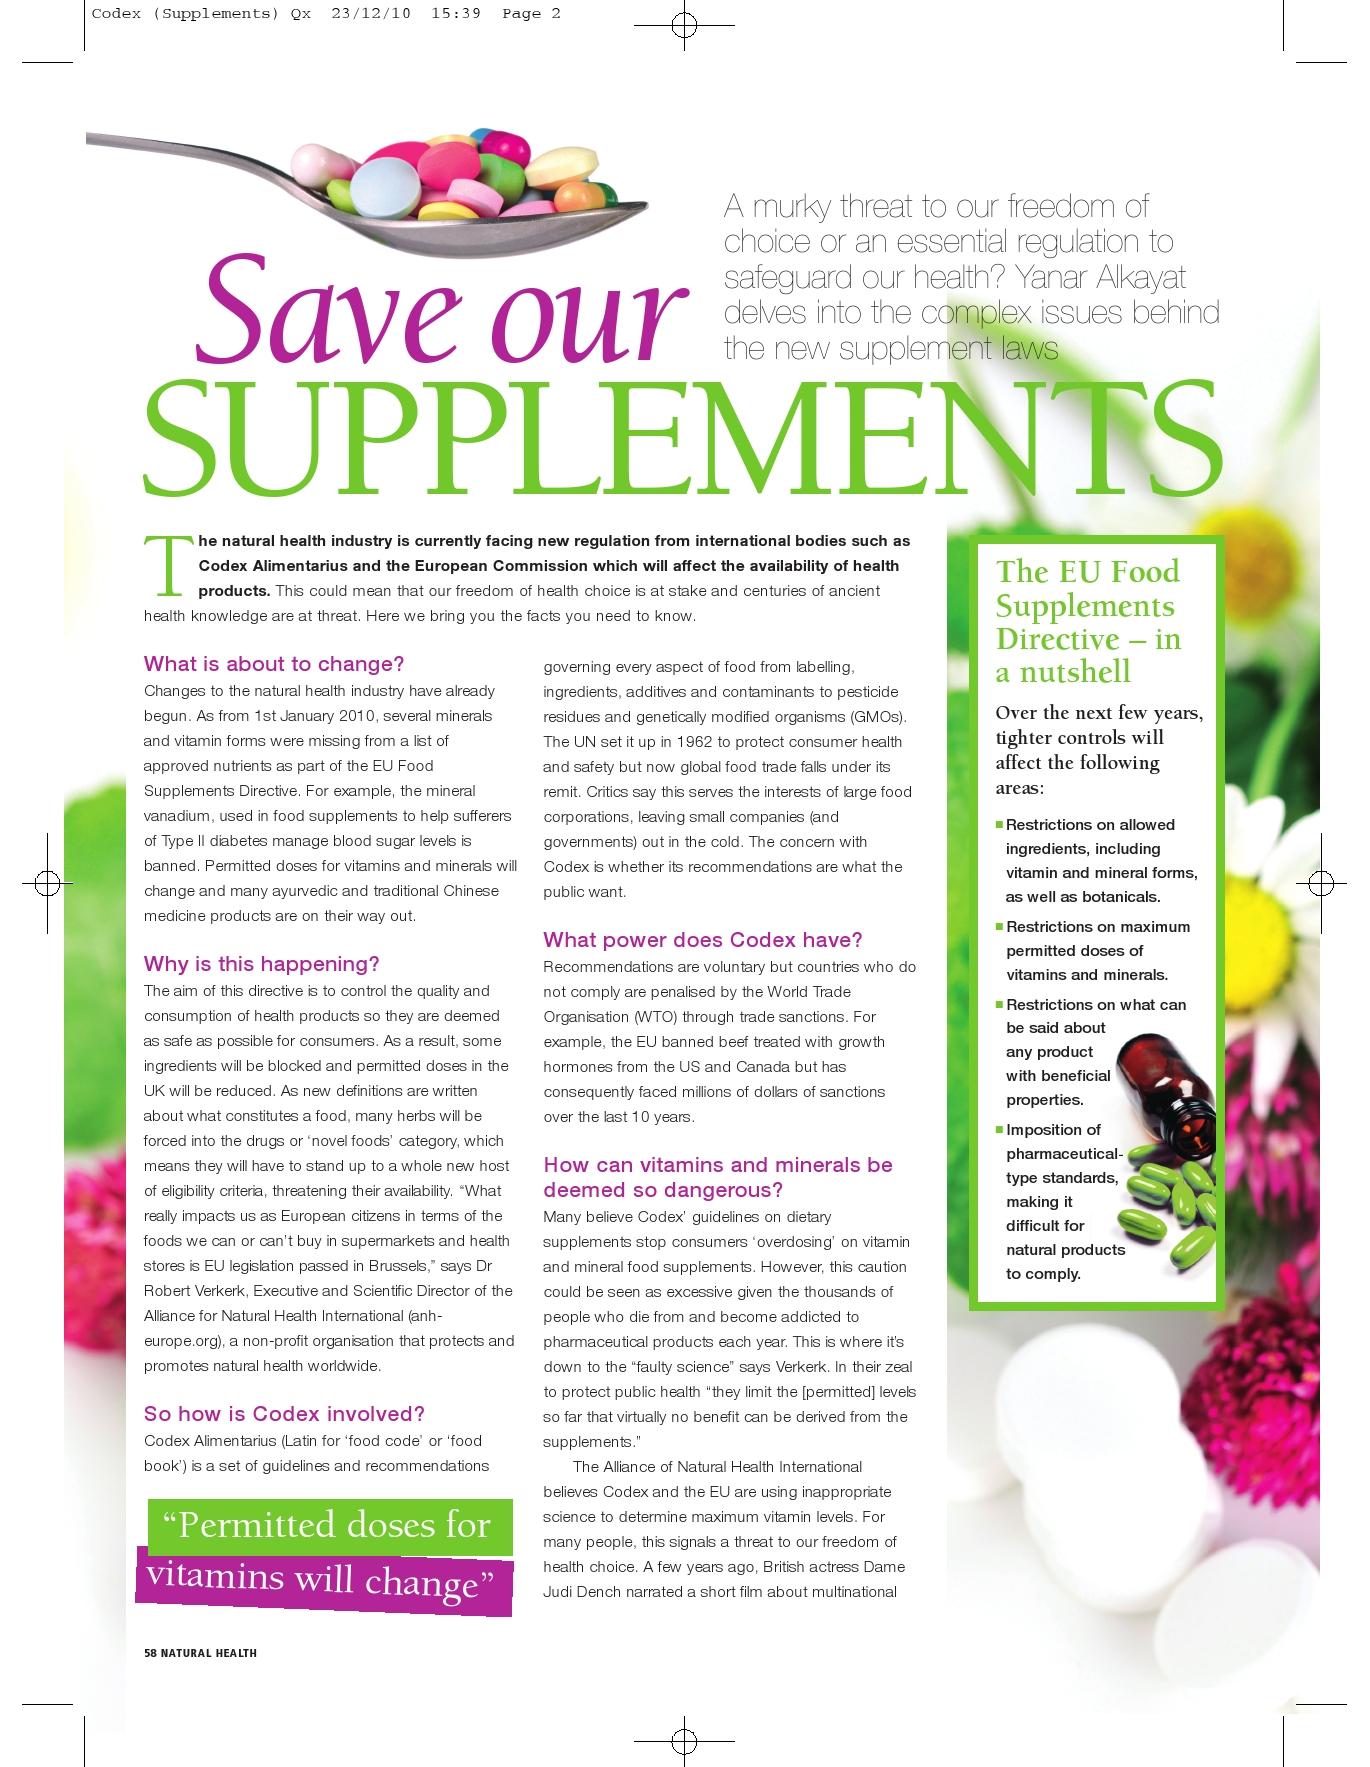 health article magazine